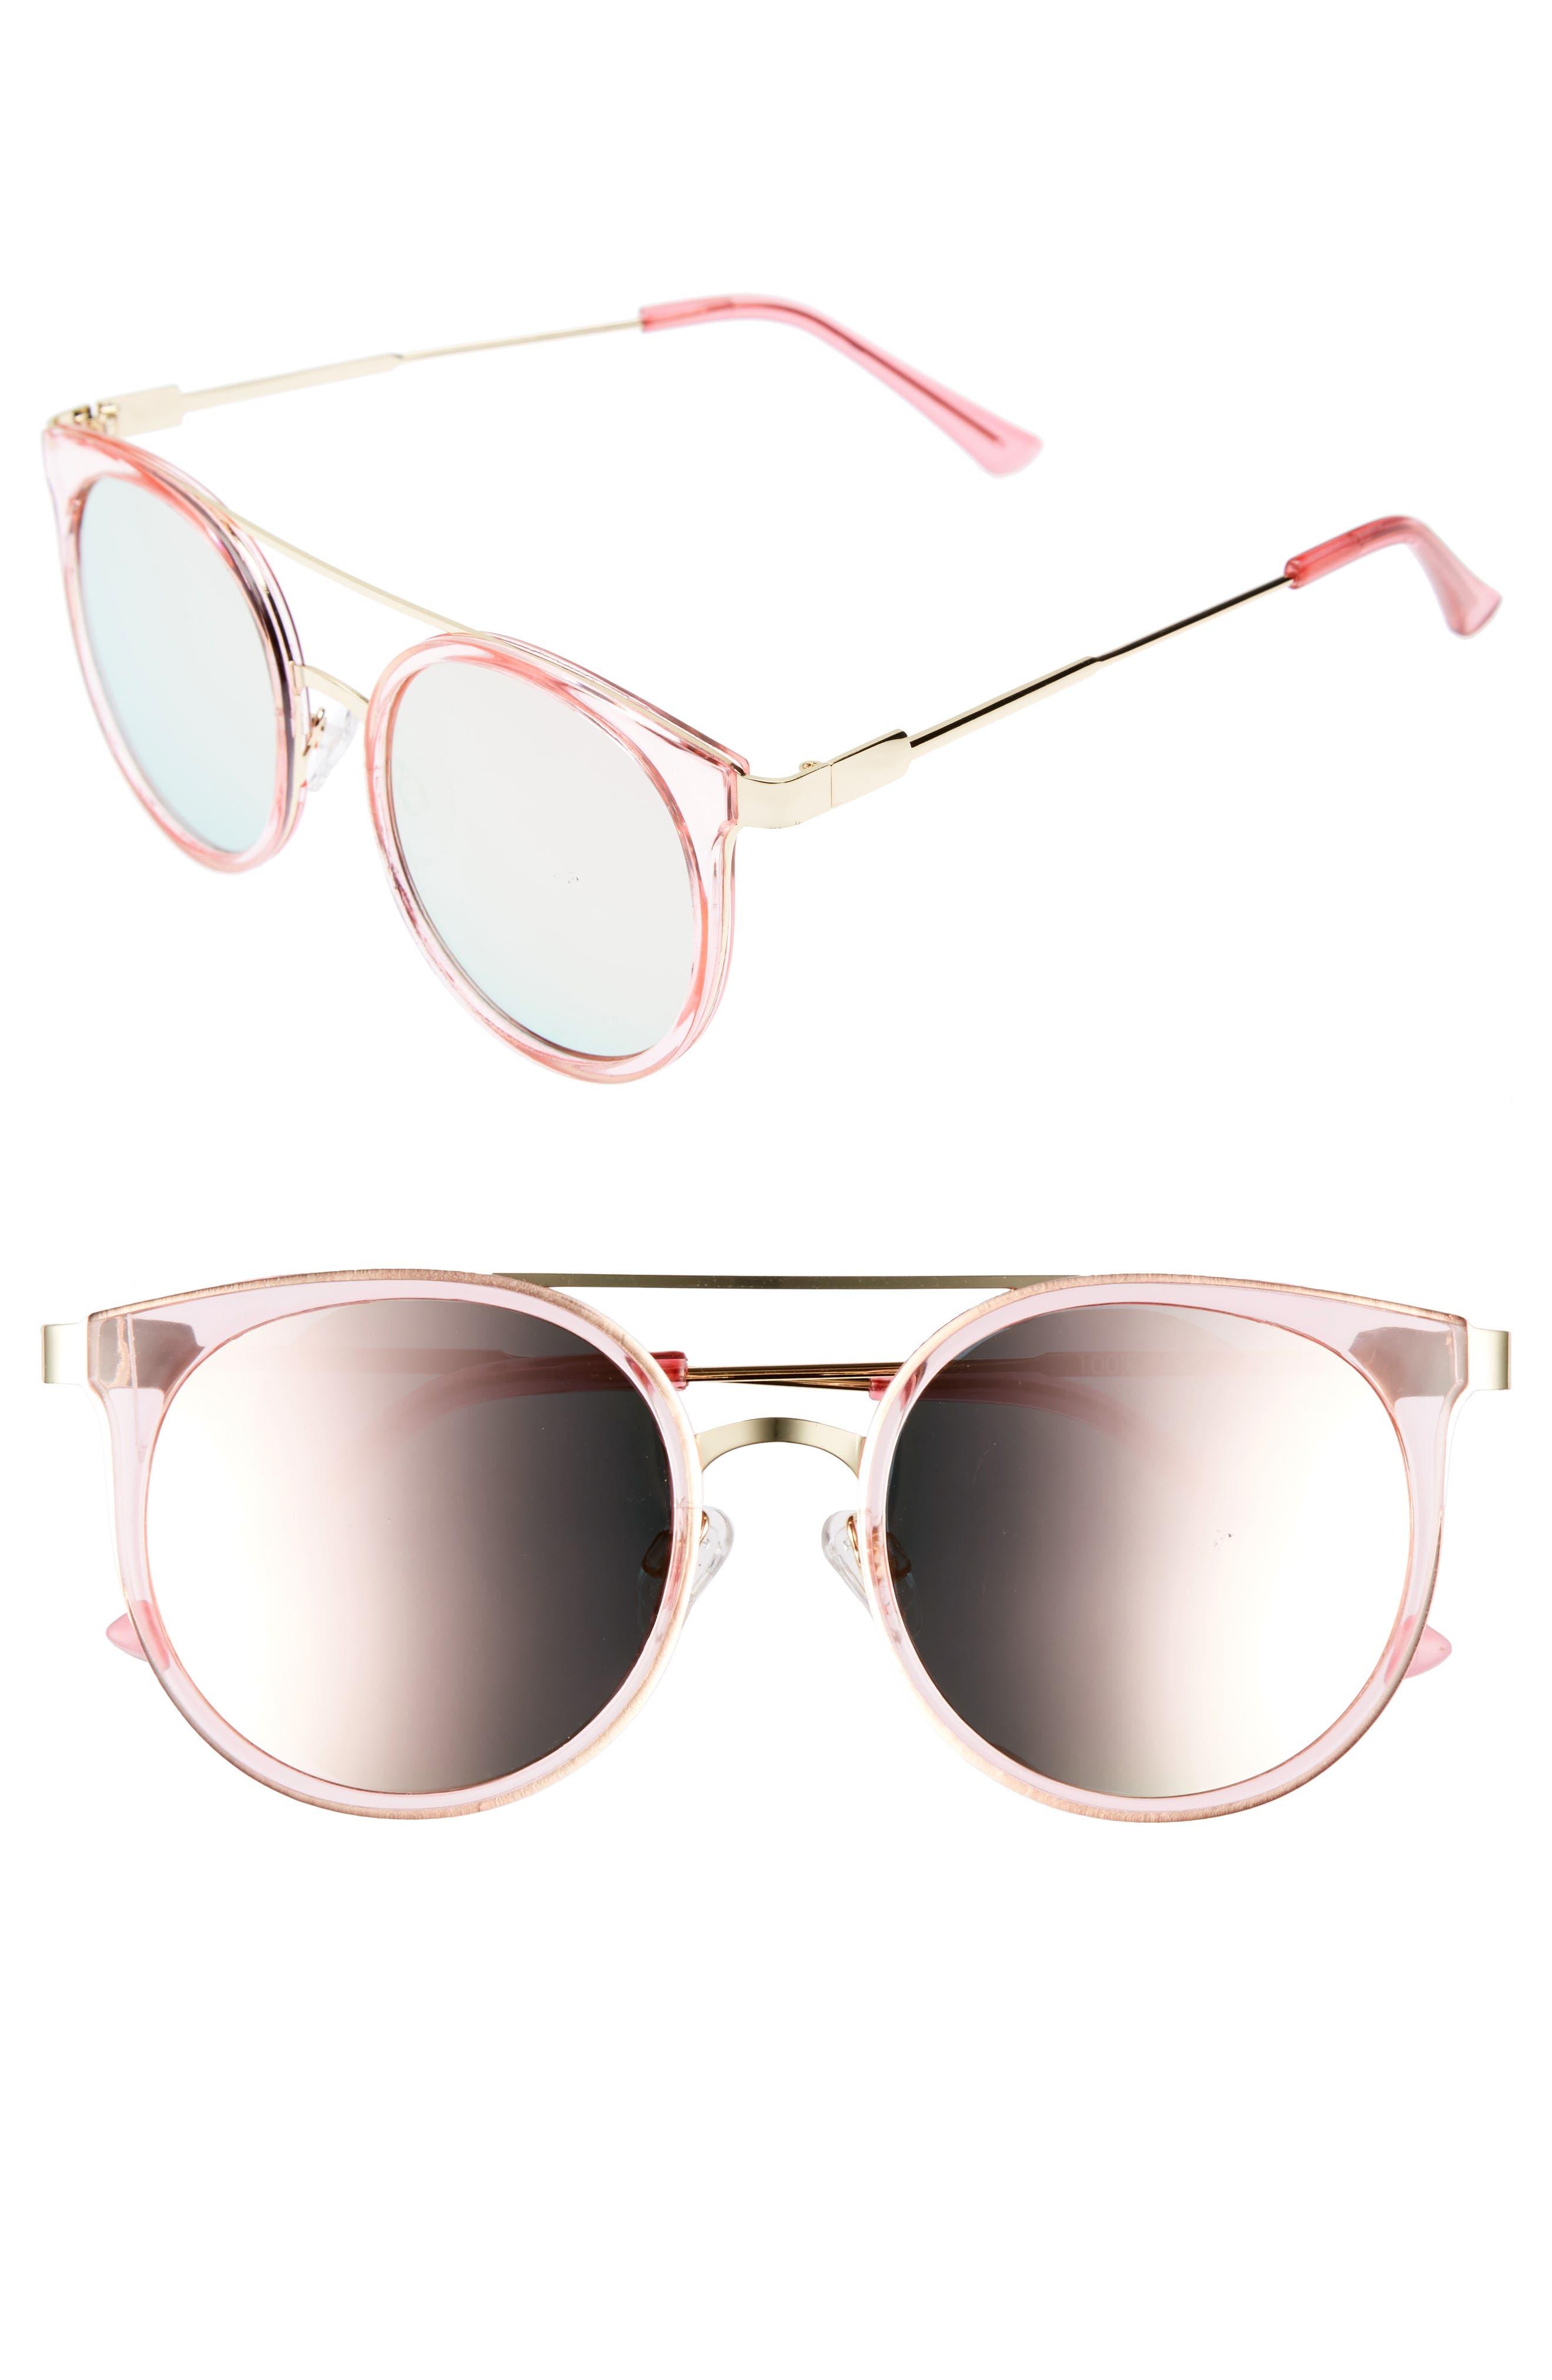 52mm Mirror Lens Round Sunglasses,                         Main,                         color, 710